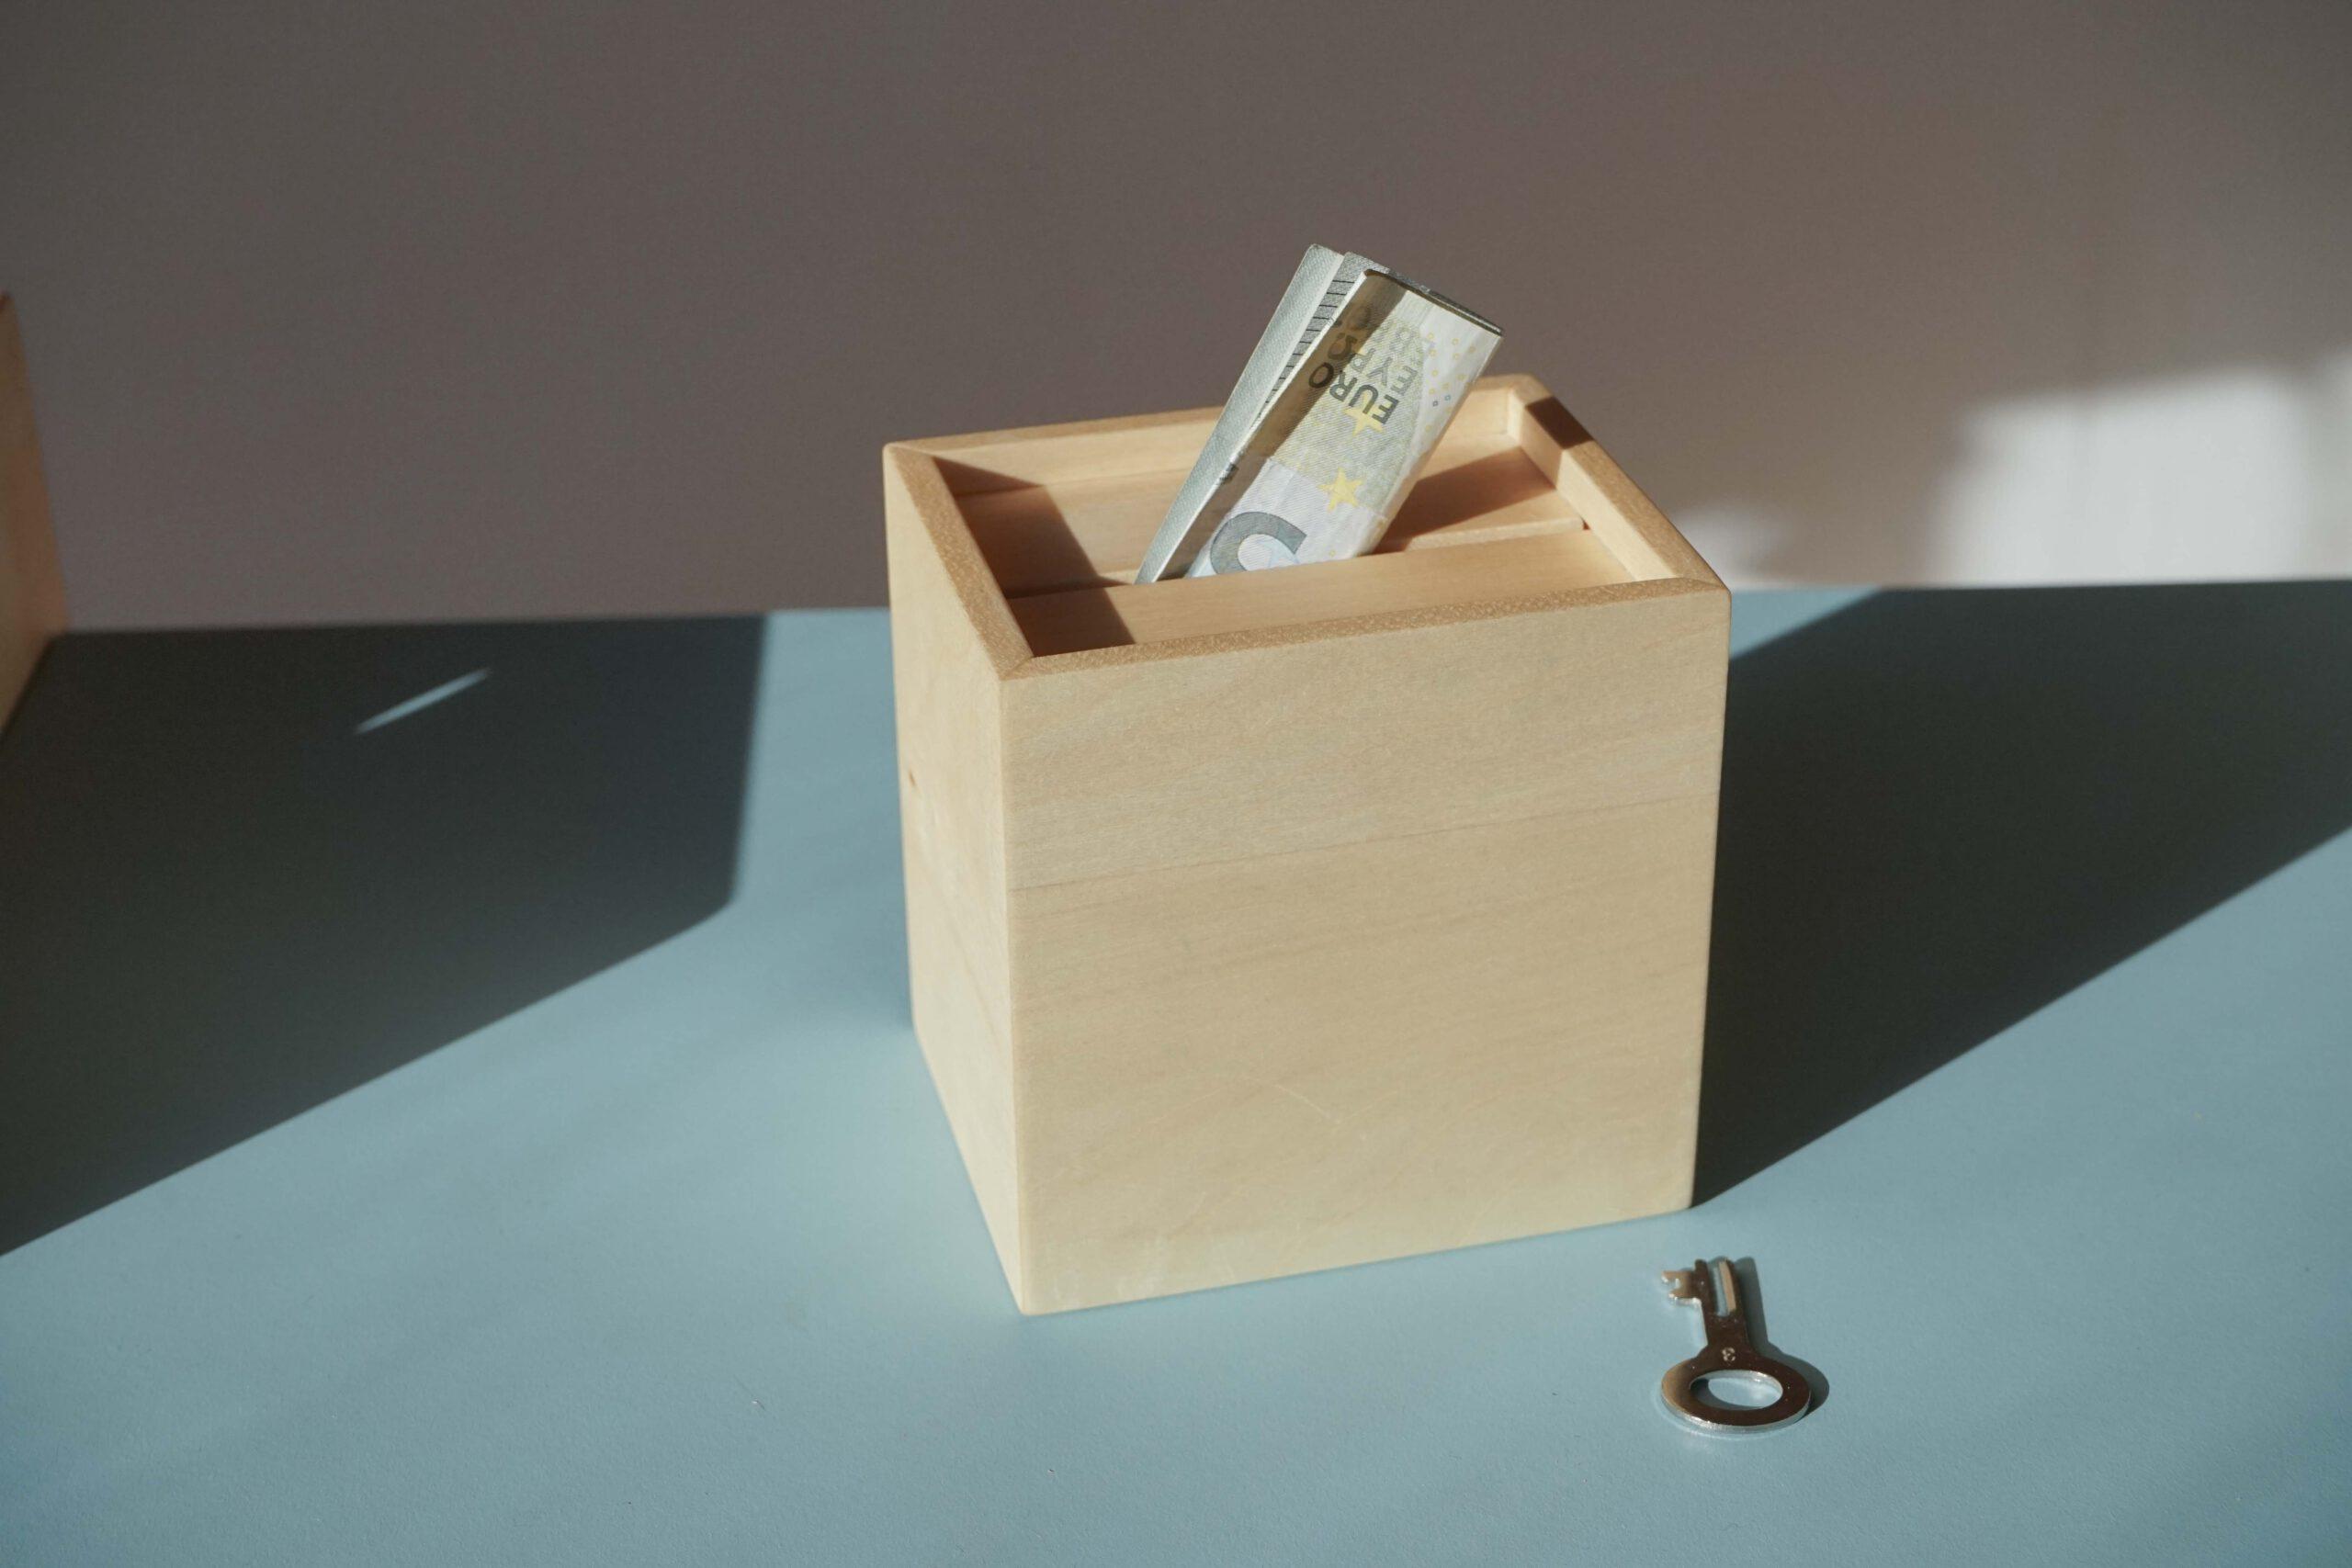 lenaturel-Schreibtisch-Aufsätze-7